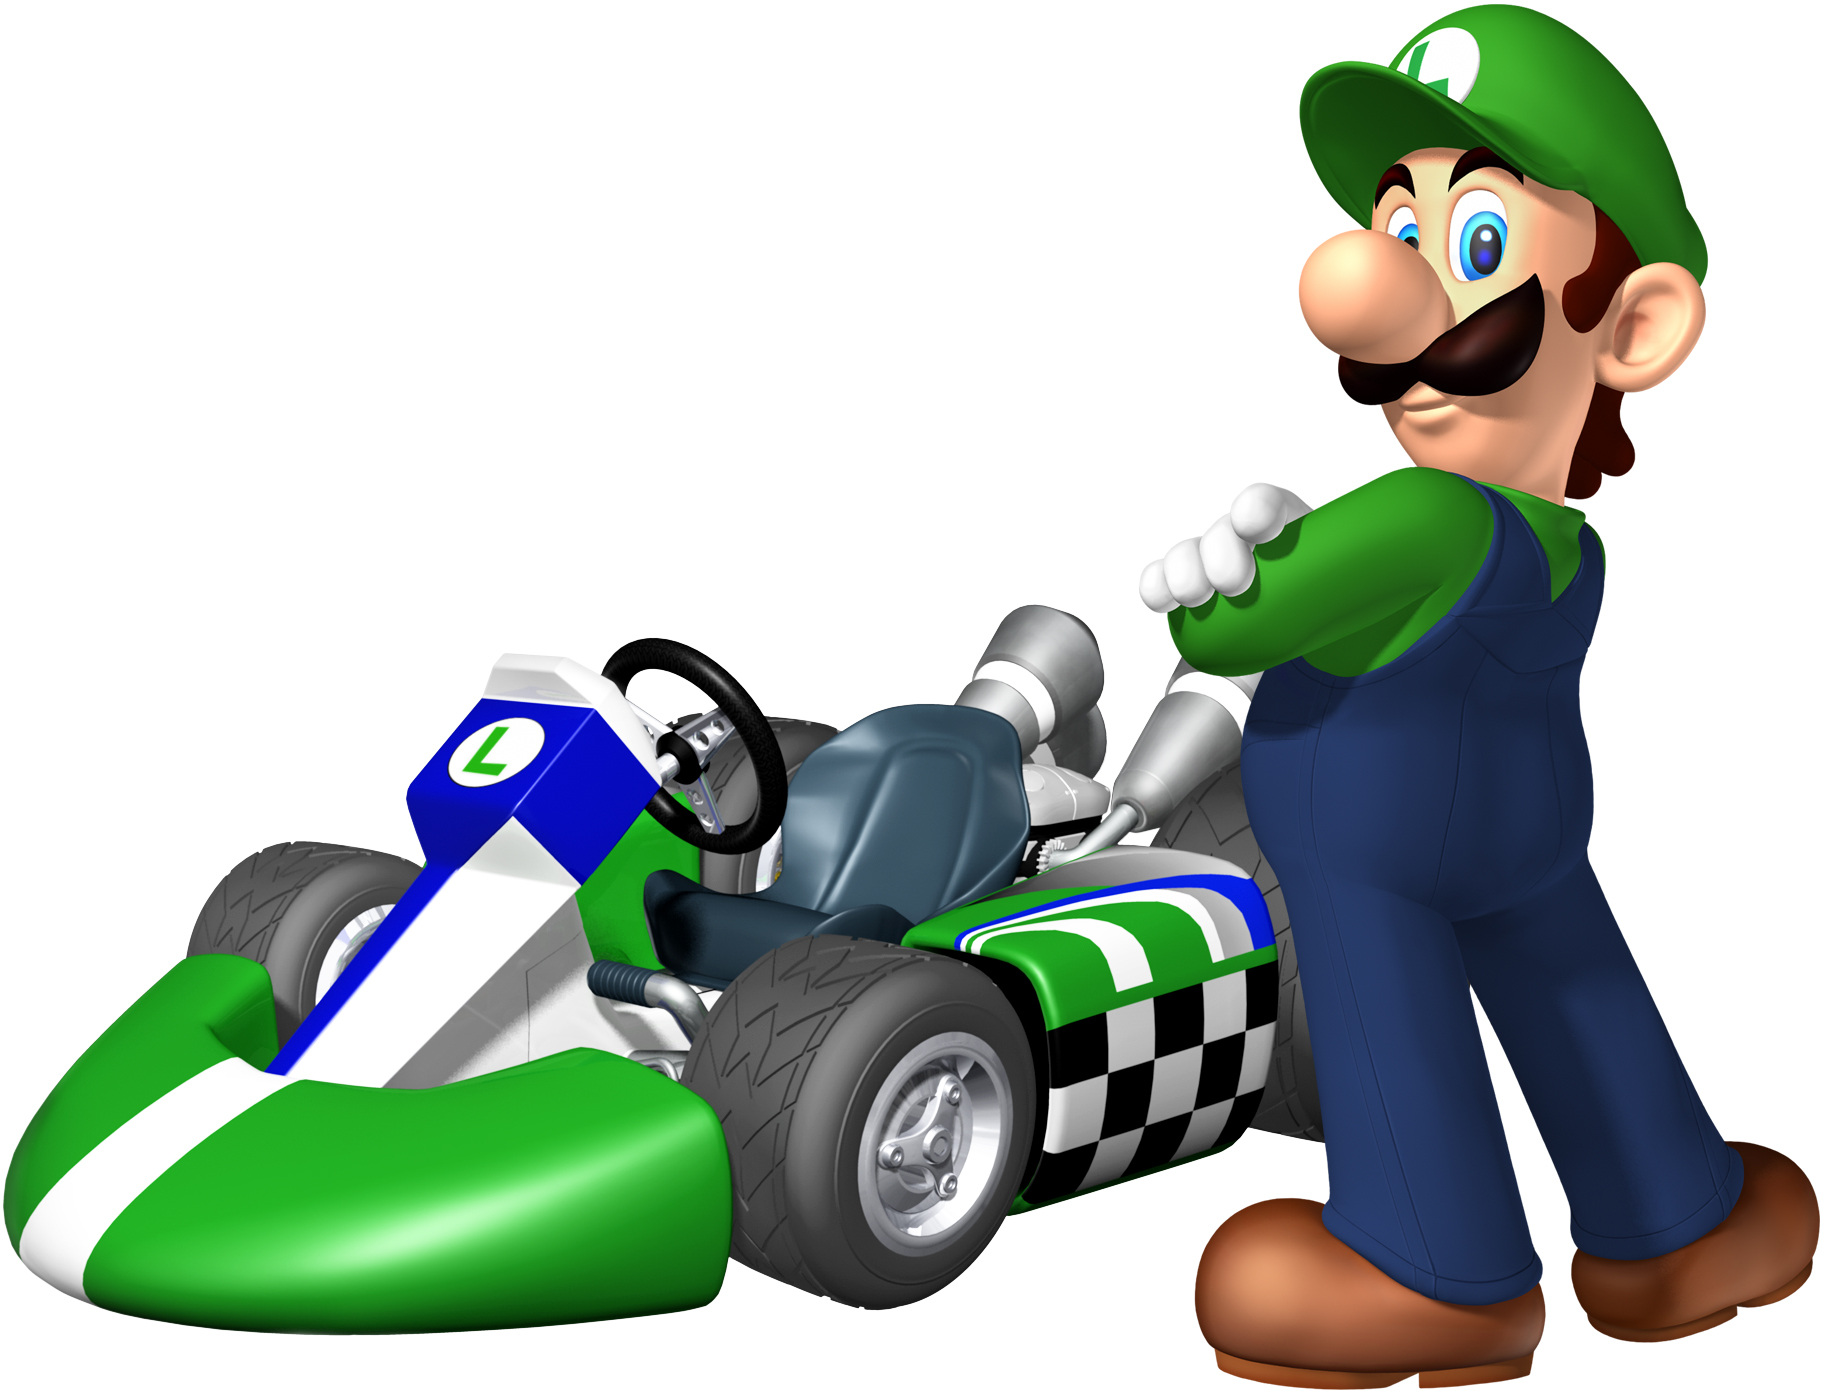 Espace membre mario kart wii - Mario kart wii voiture ...